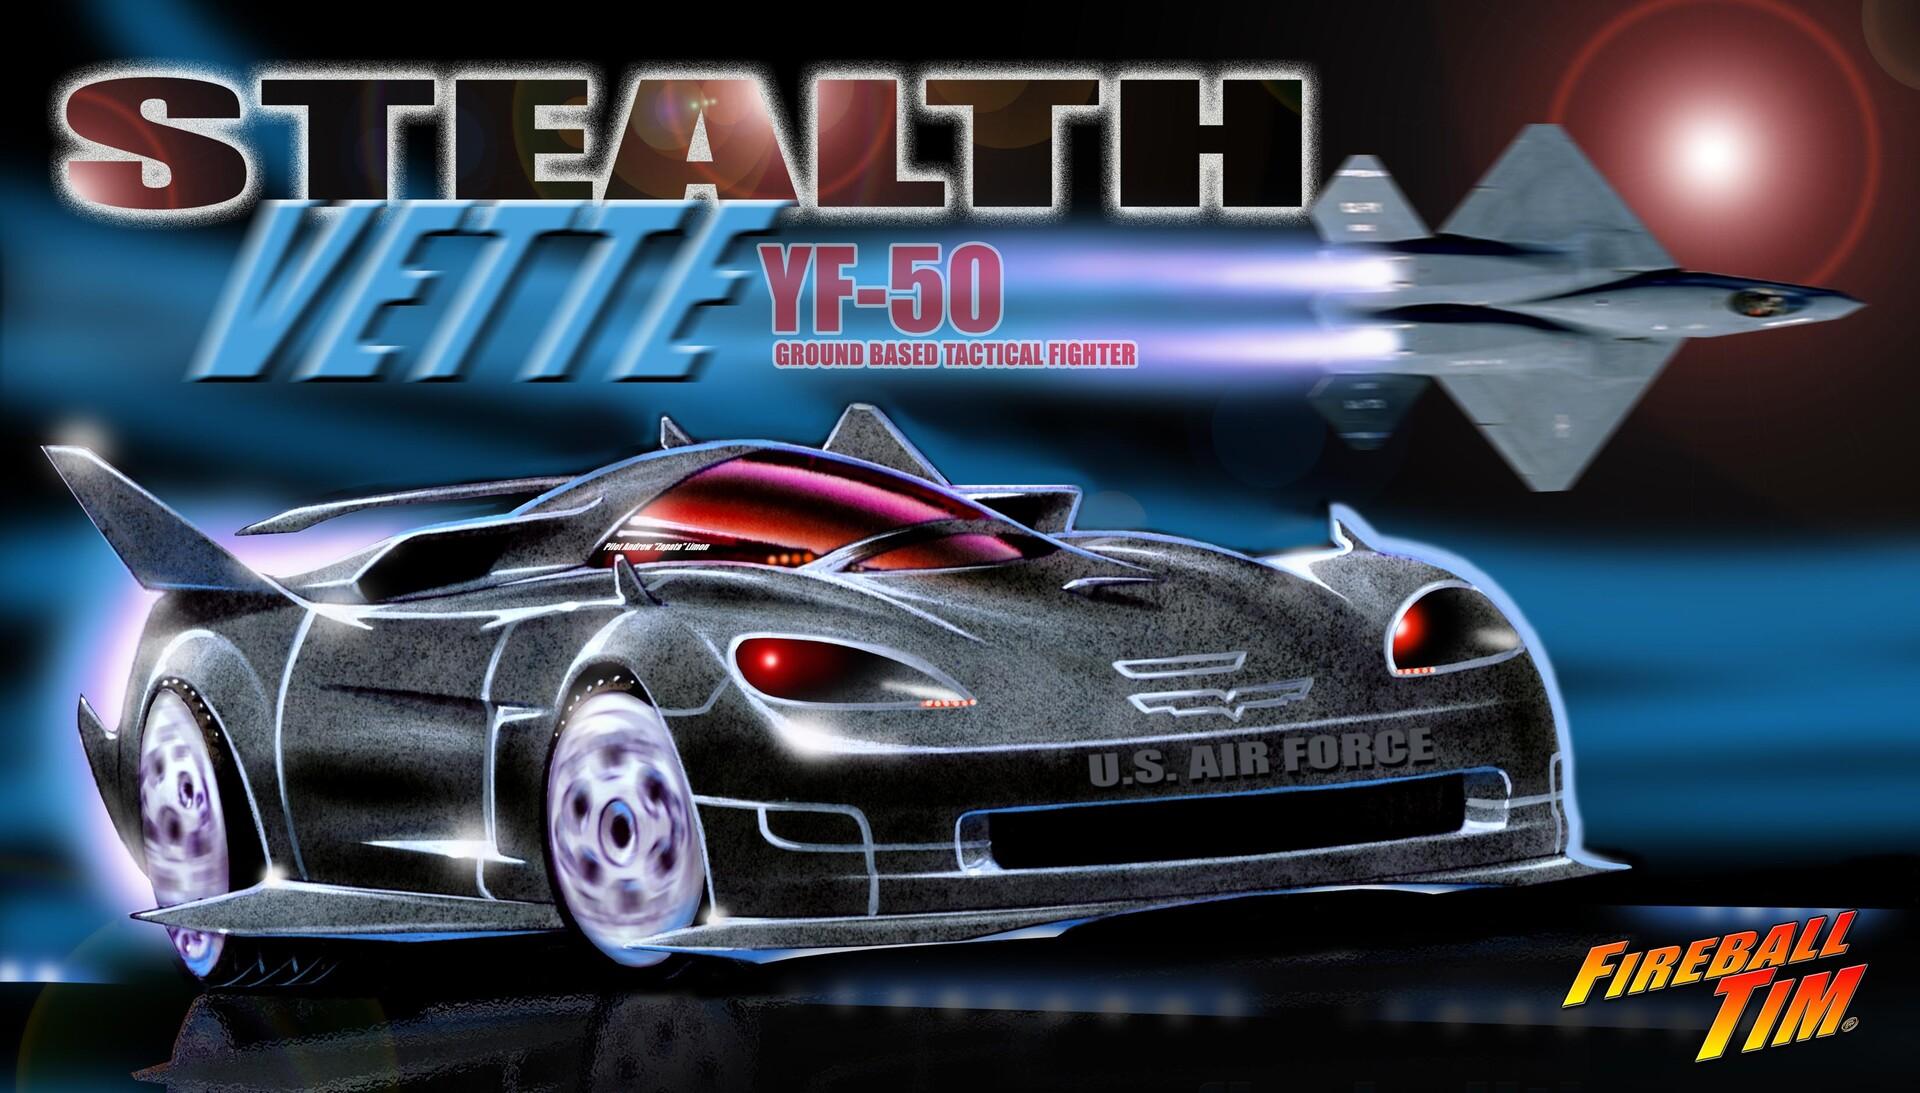 STEALTH VETTE  - PRIVATE CLIENT